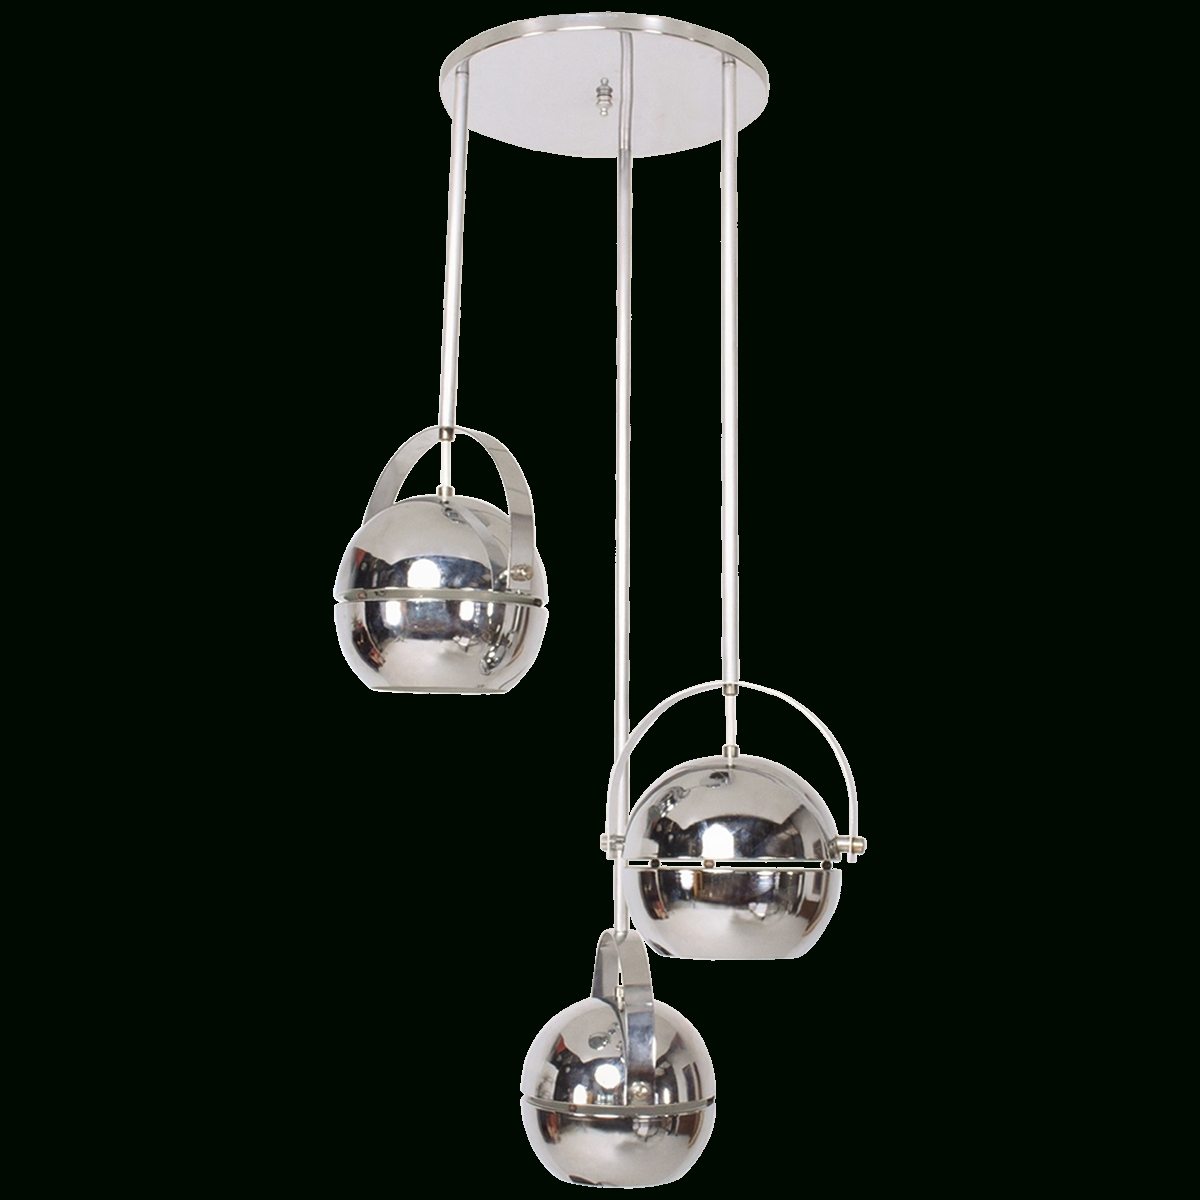 Famous Viyet – Designer Furniture – Lighting – Mid Century Modern Chrome Pertaining To Modern Chrome Chandelier (View 20 of 20)